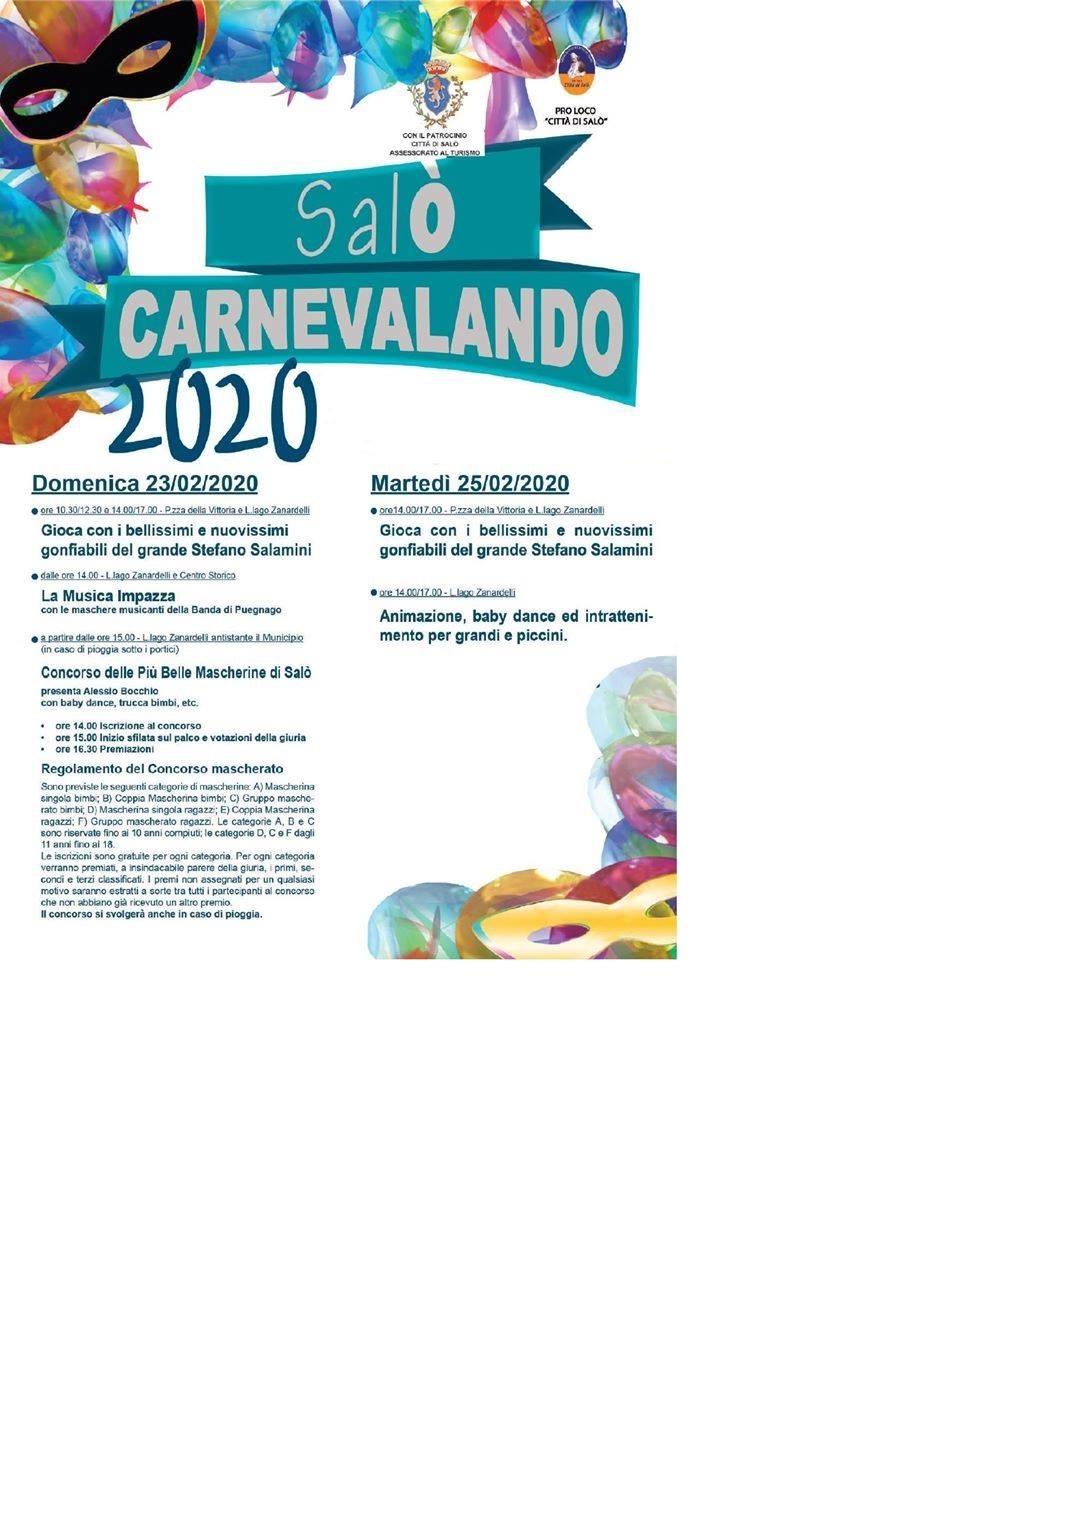 Carnevalando 2020